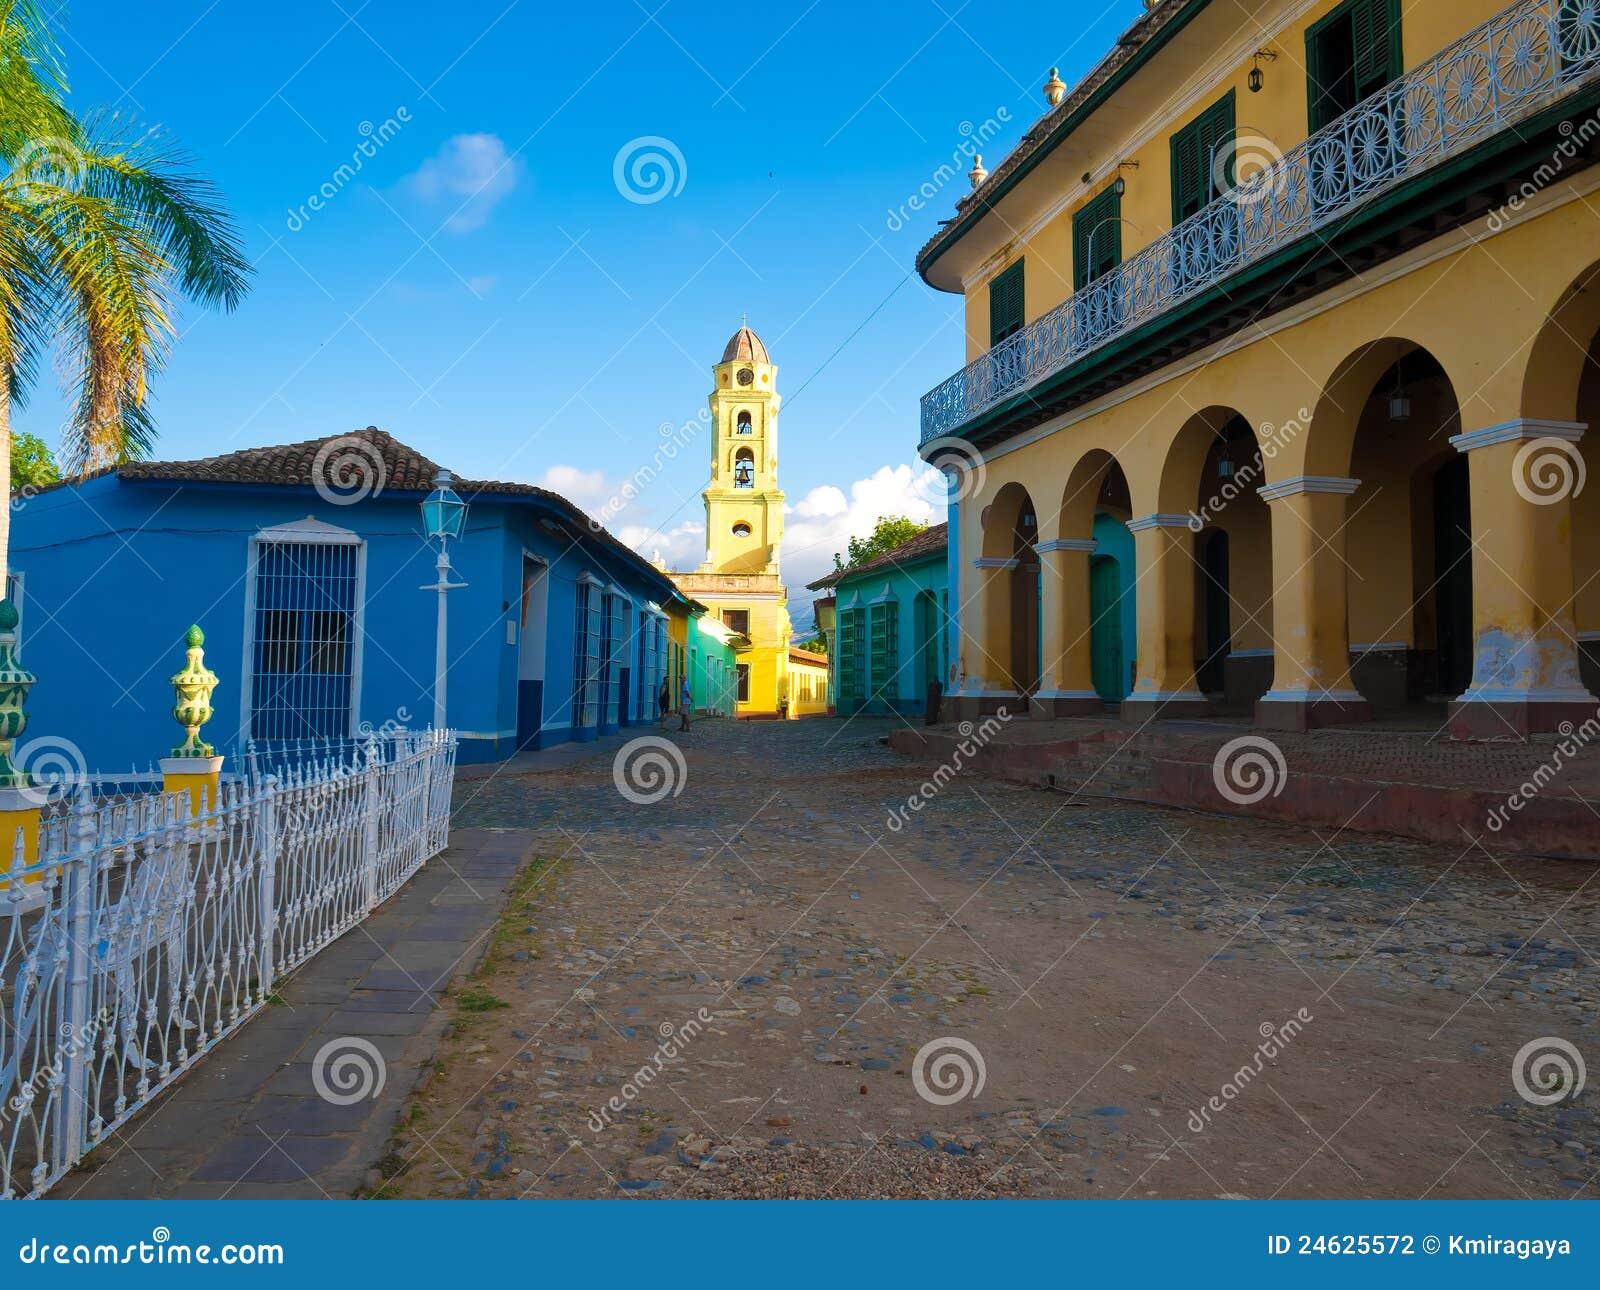 La ville coloniale du Trinidad au Cuba